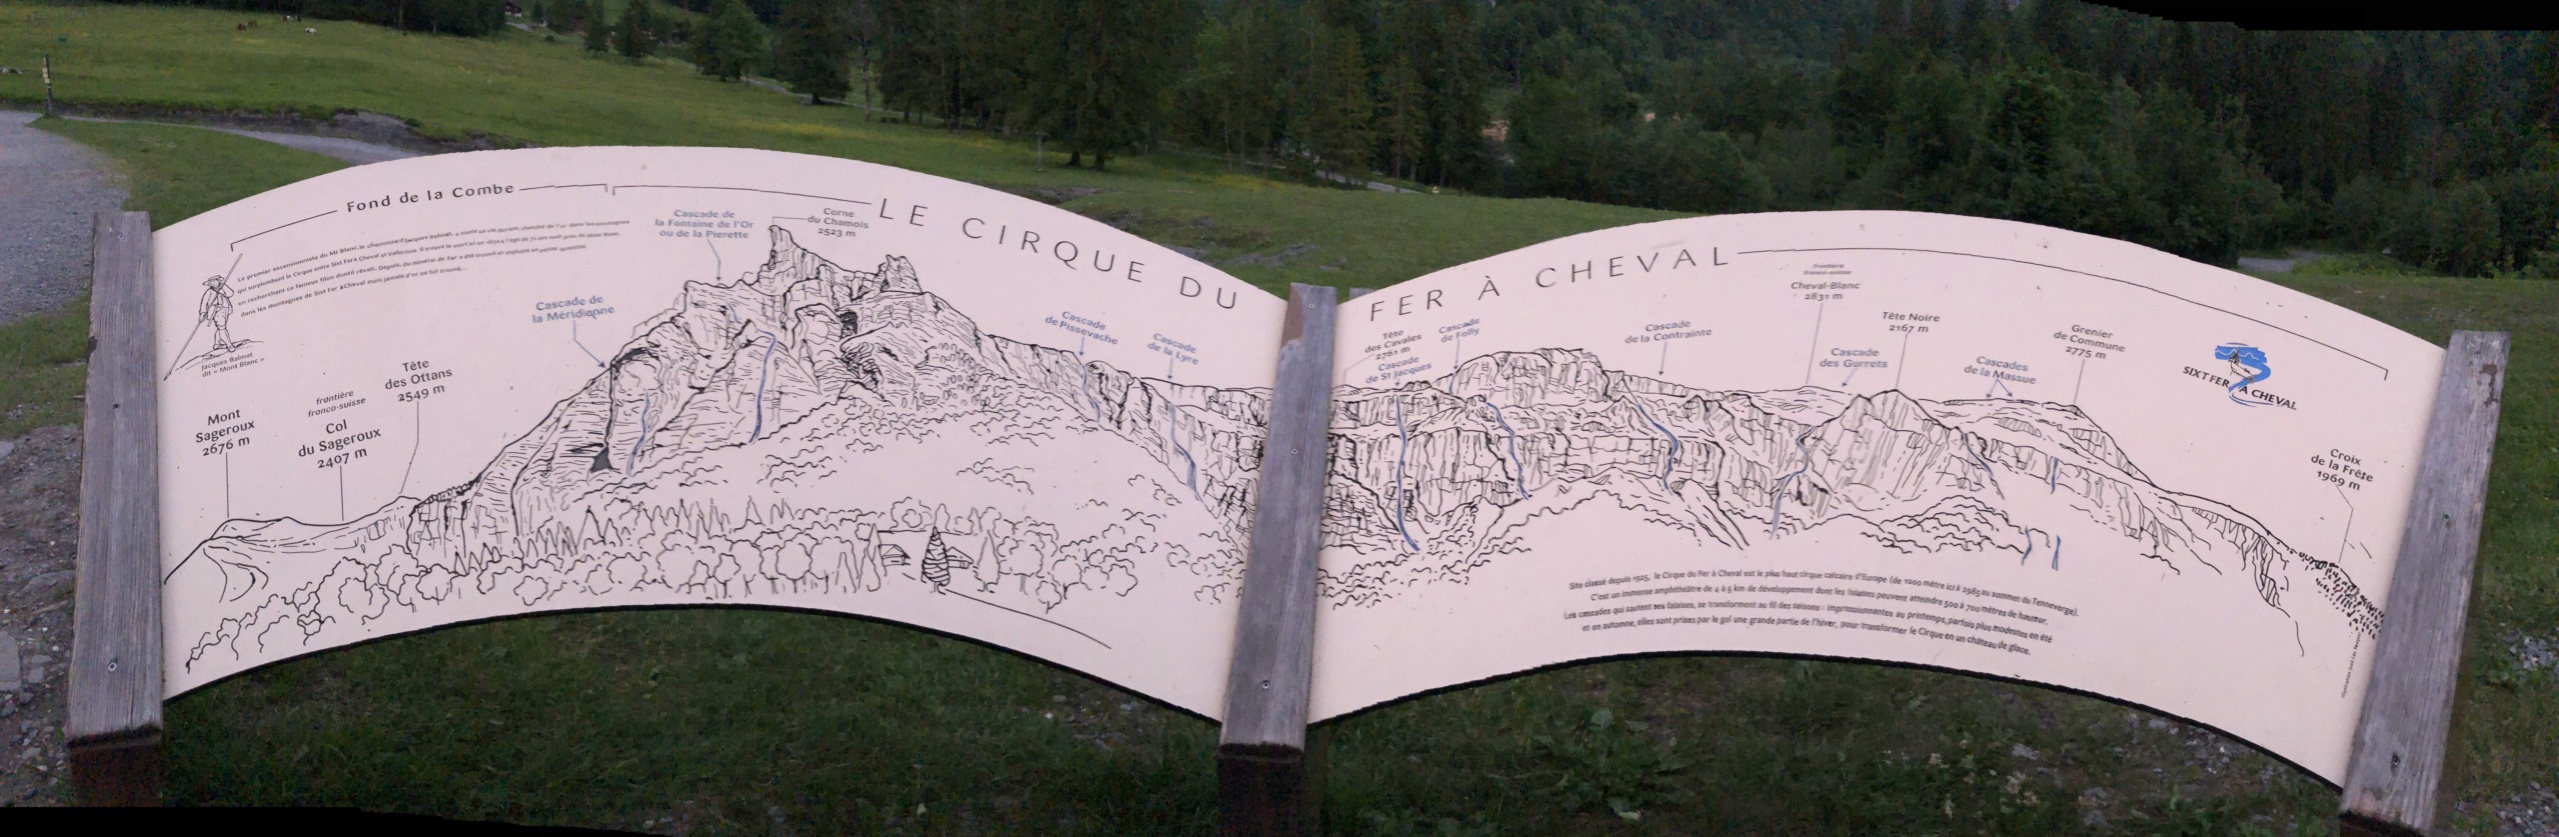 Petites balades en Rhône-Alpes - Page 3 Sixt_f13